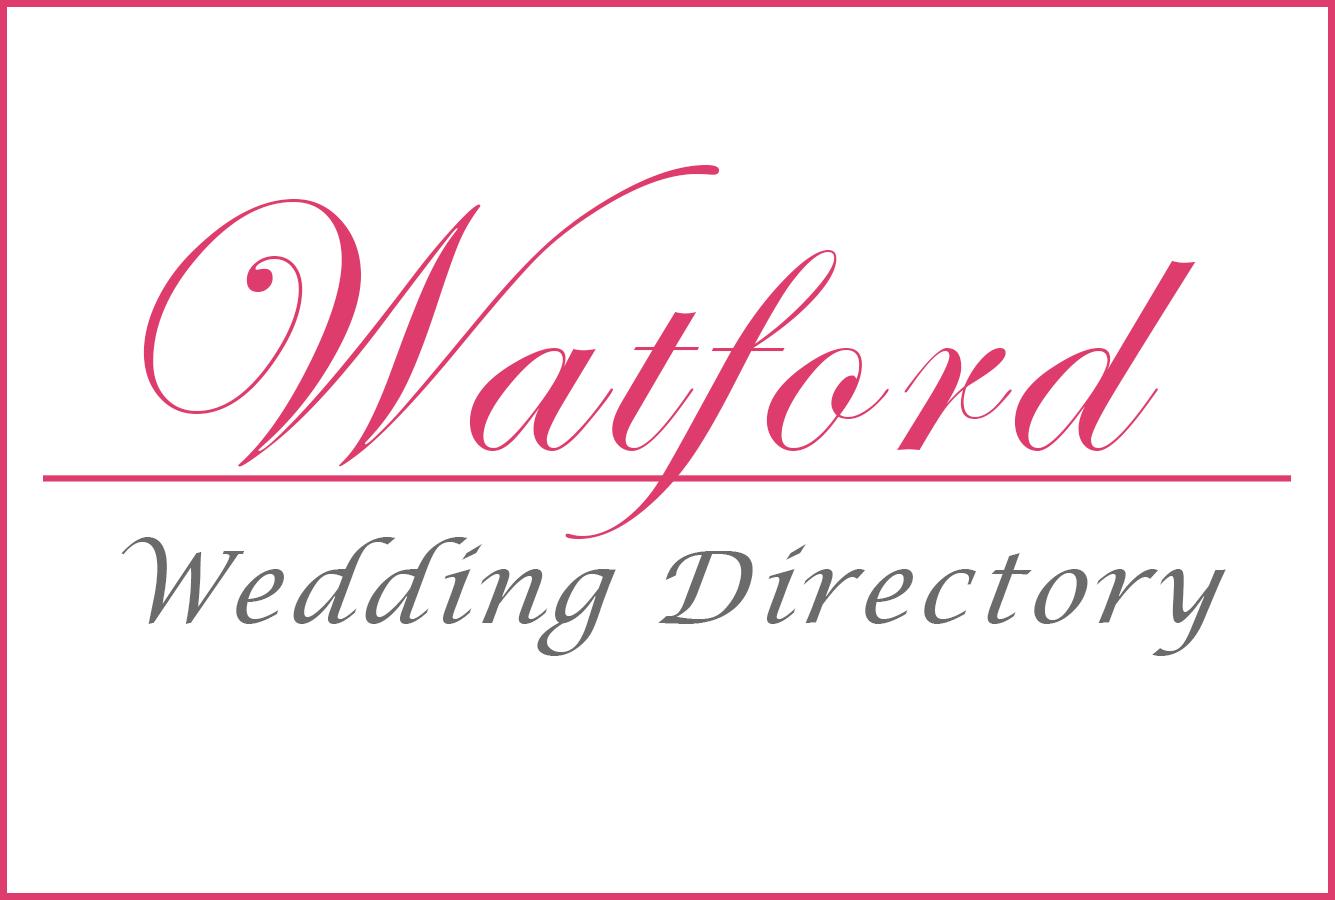 Watford Wedding Directory